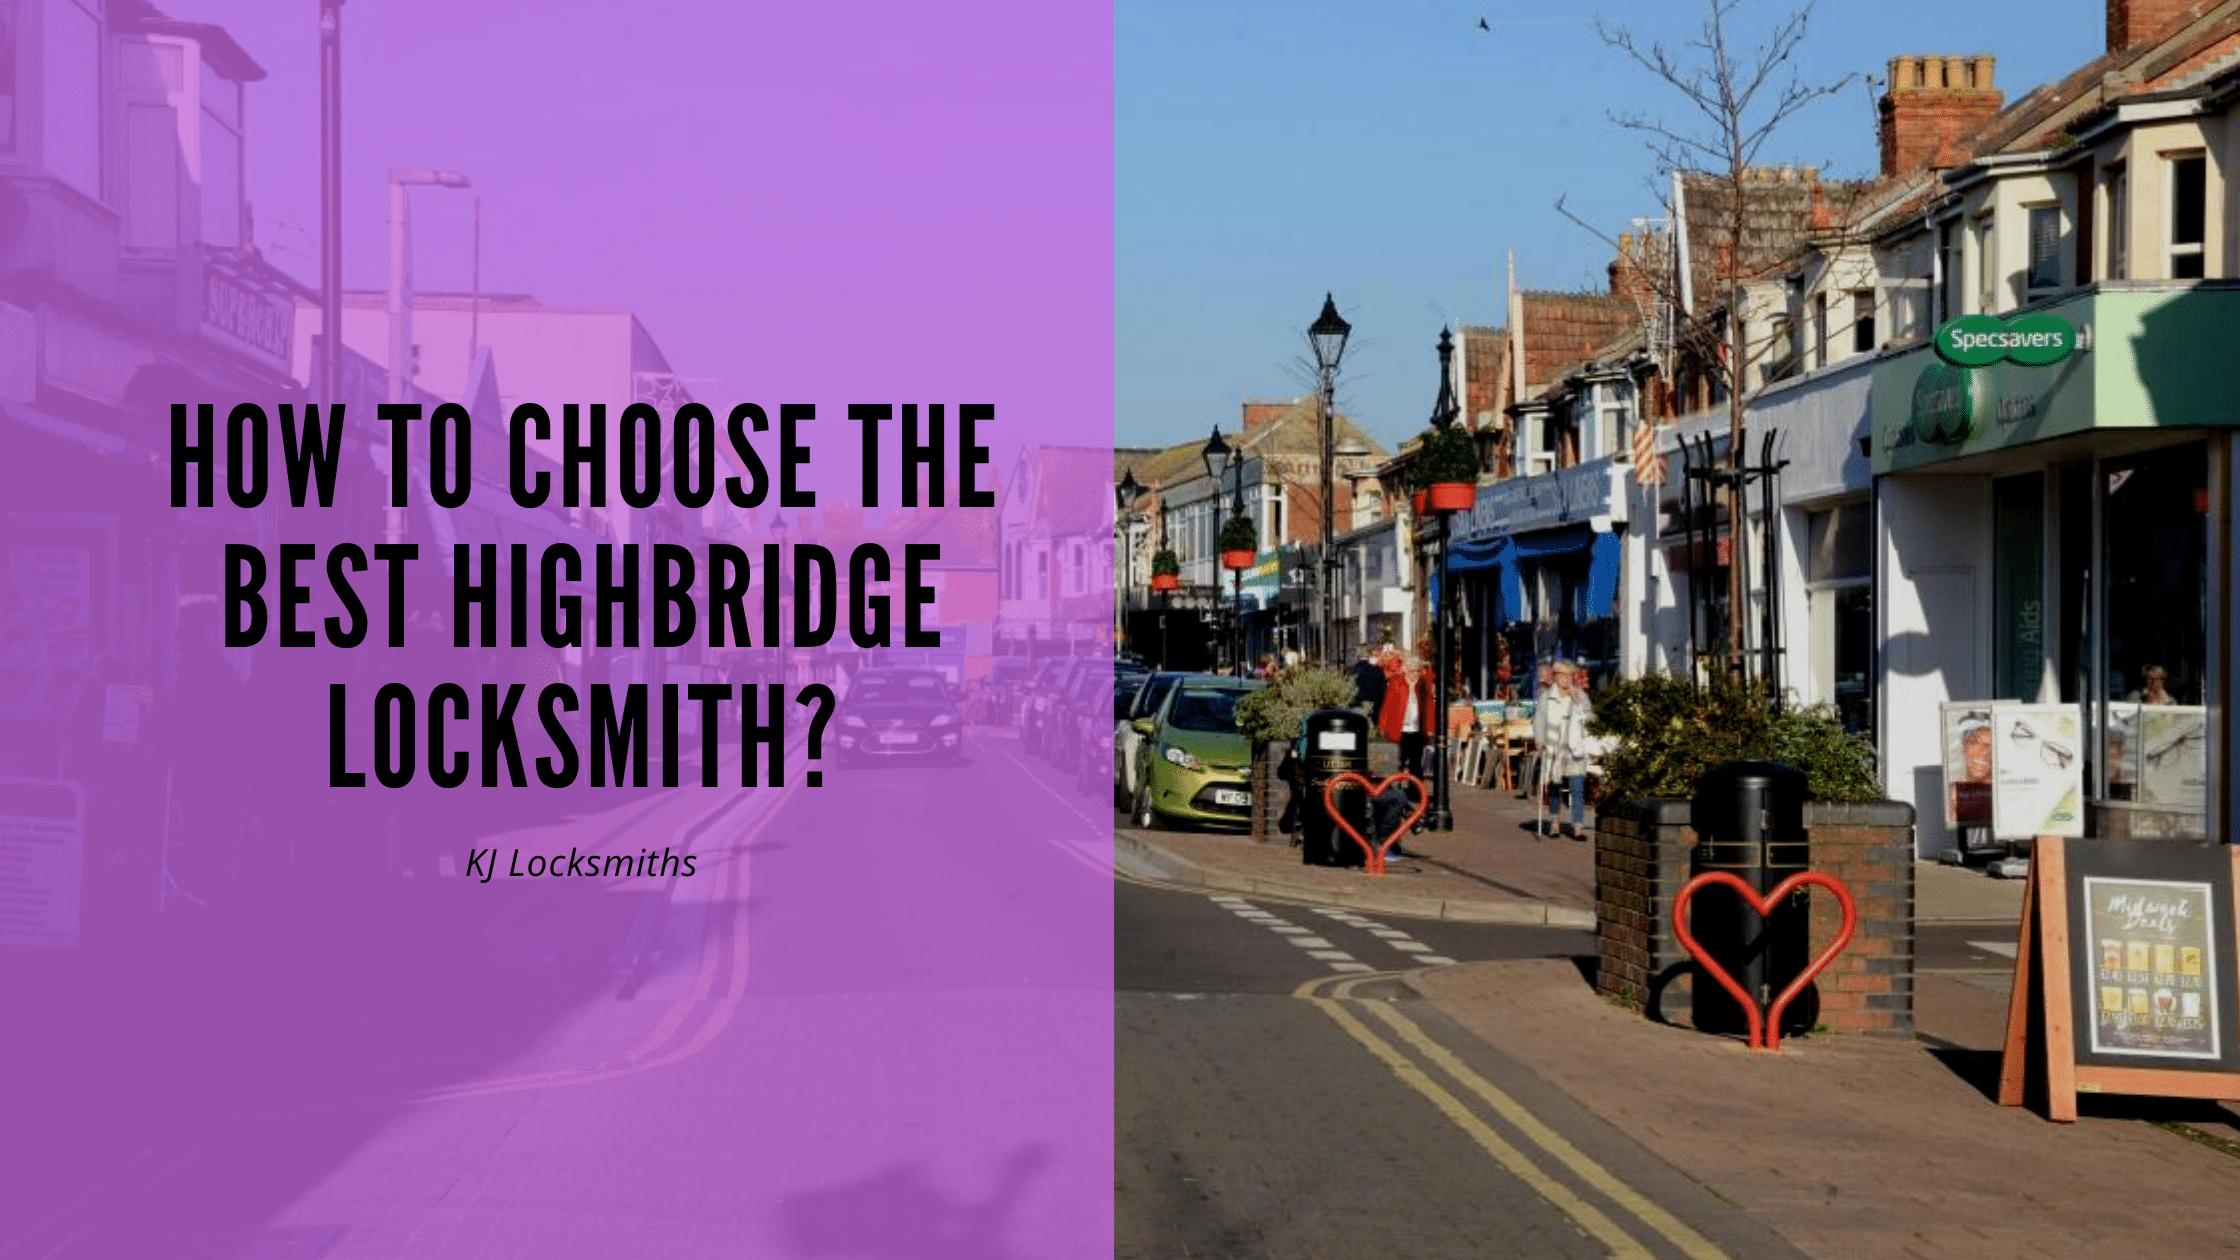 How To Choose The Best Highbridge Locksmith